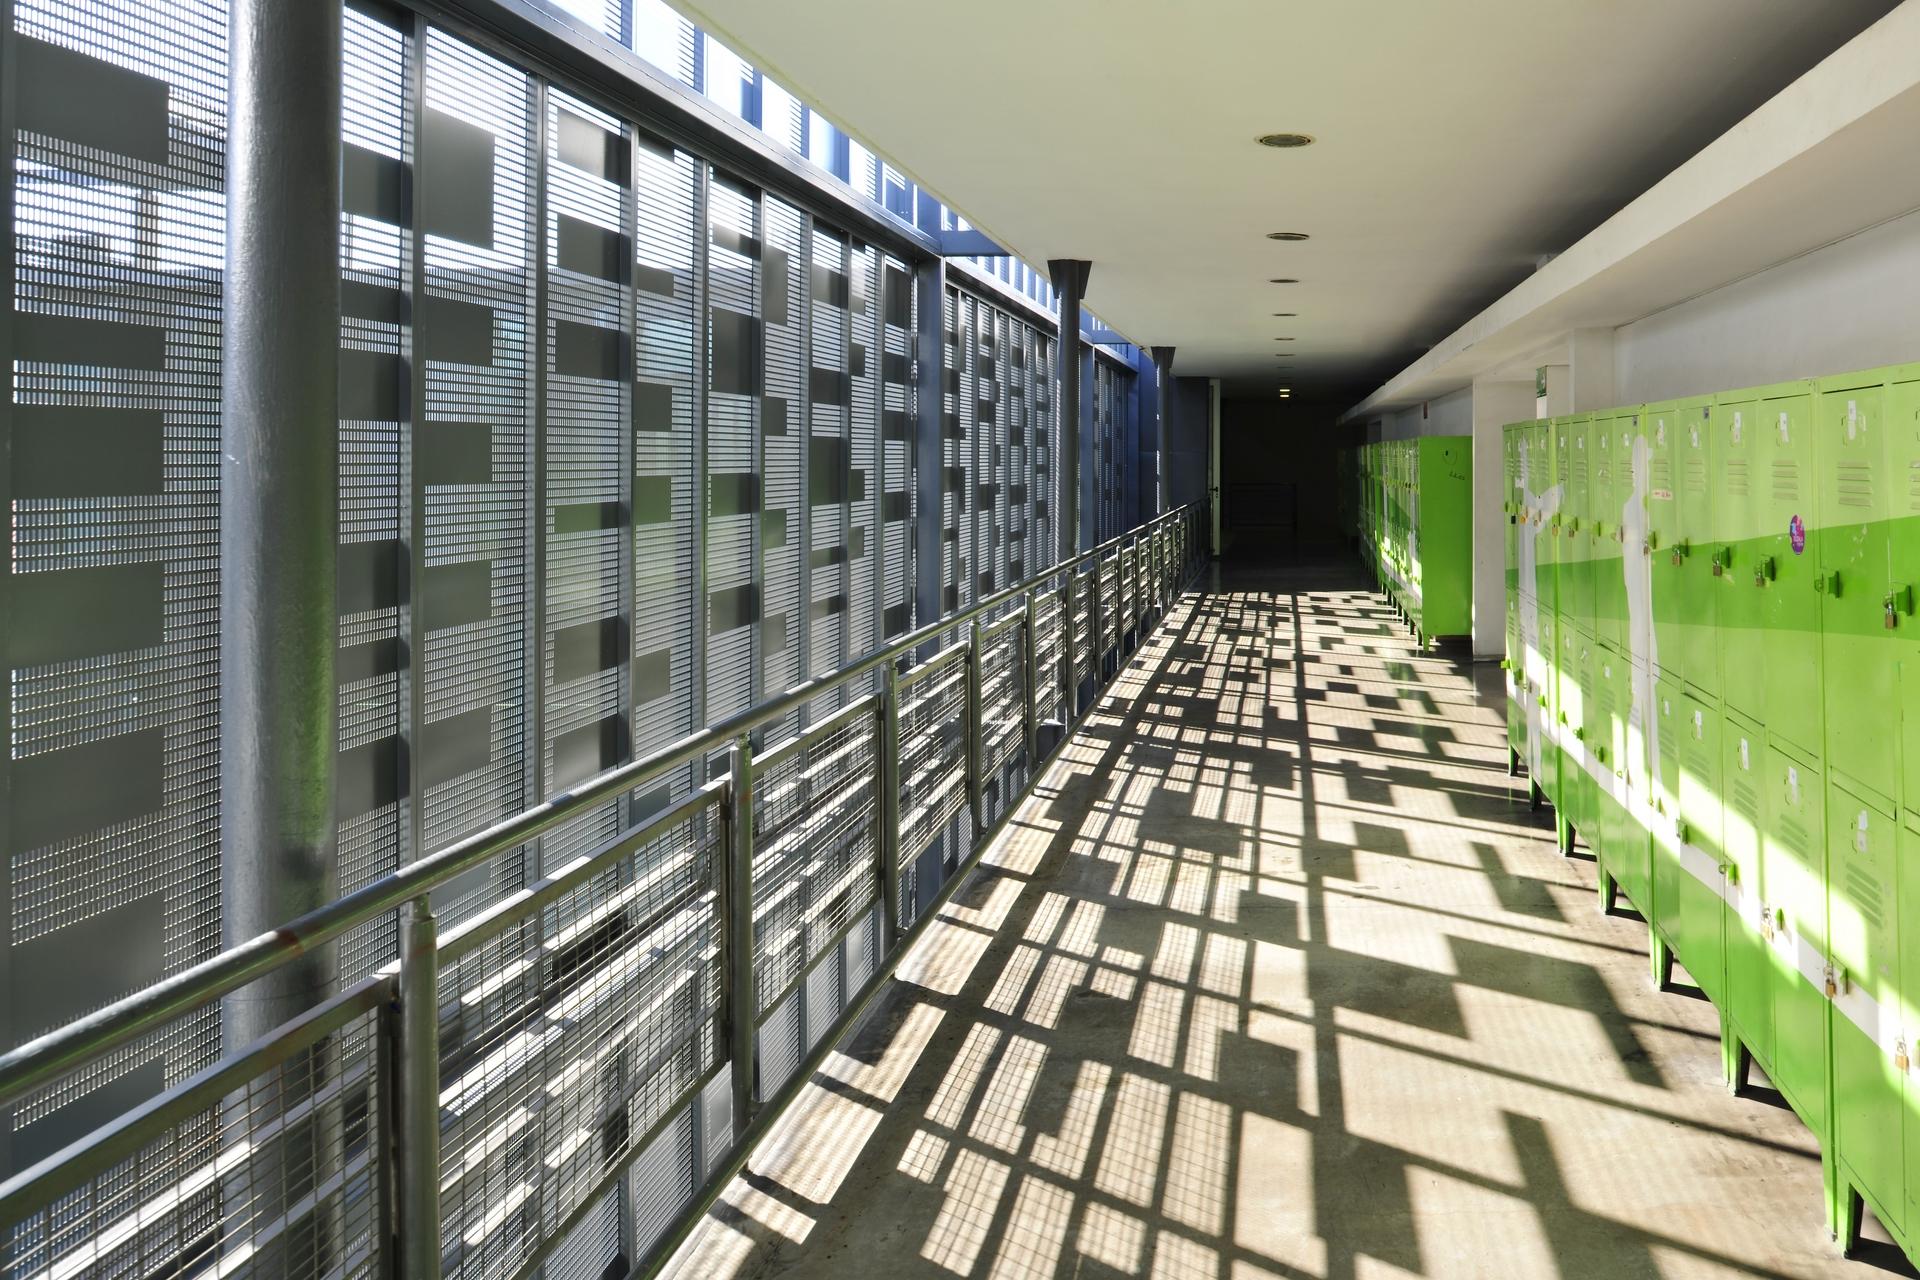 Universidad diego portales facultad de arquitectura for Facultad arquitectura